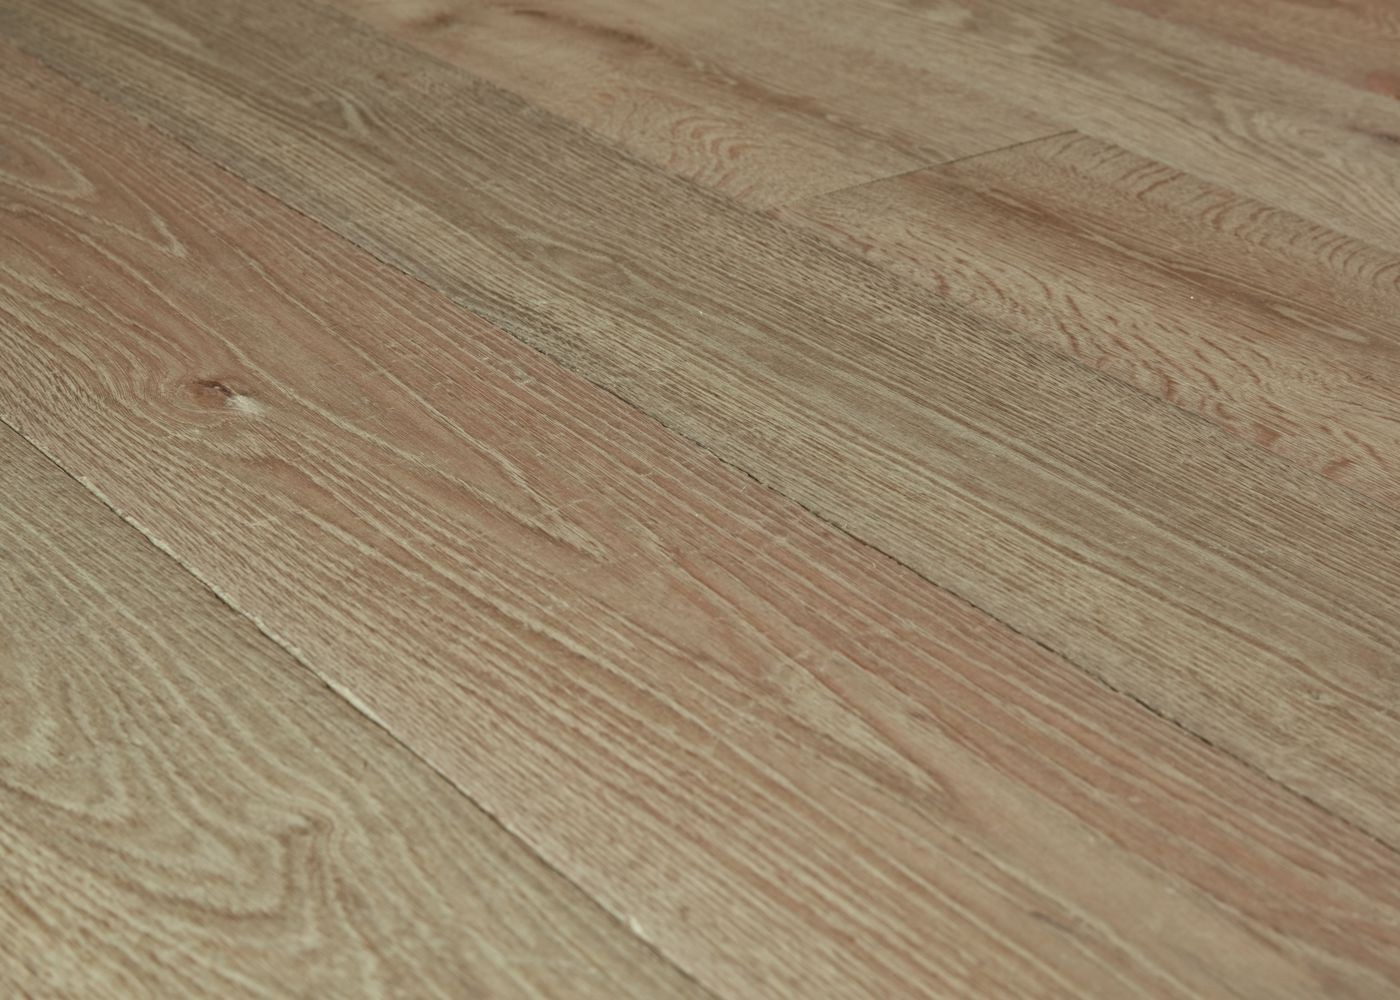 Lot 62 - Parquet chêne contrecollé vieilli Brun clair huile aqua - 60,84 m2  Ep 15mm